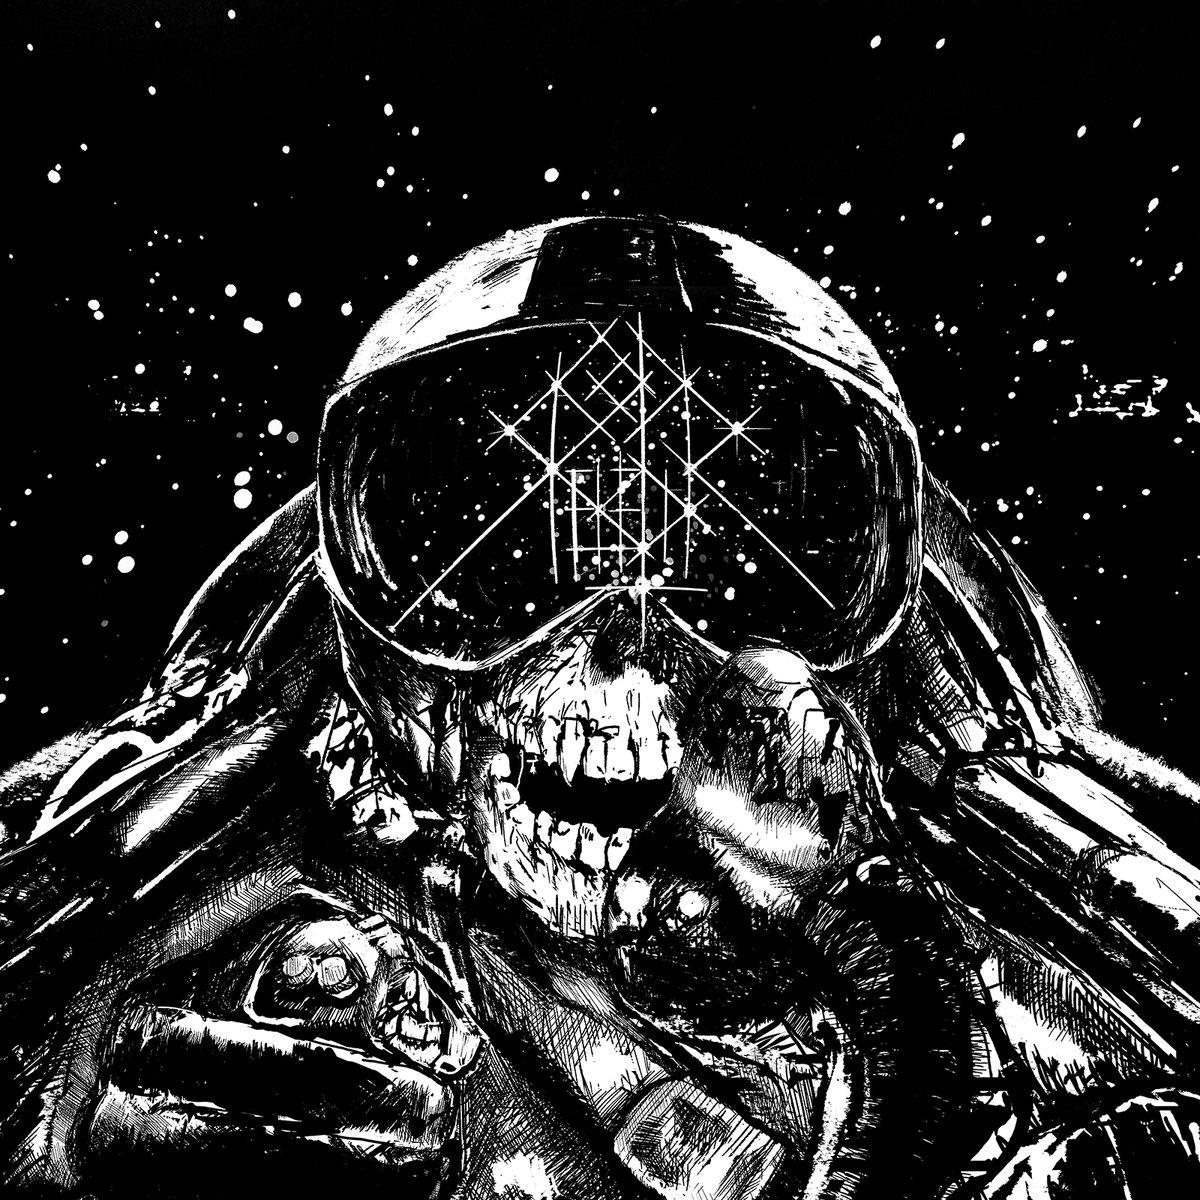 cop skeletons